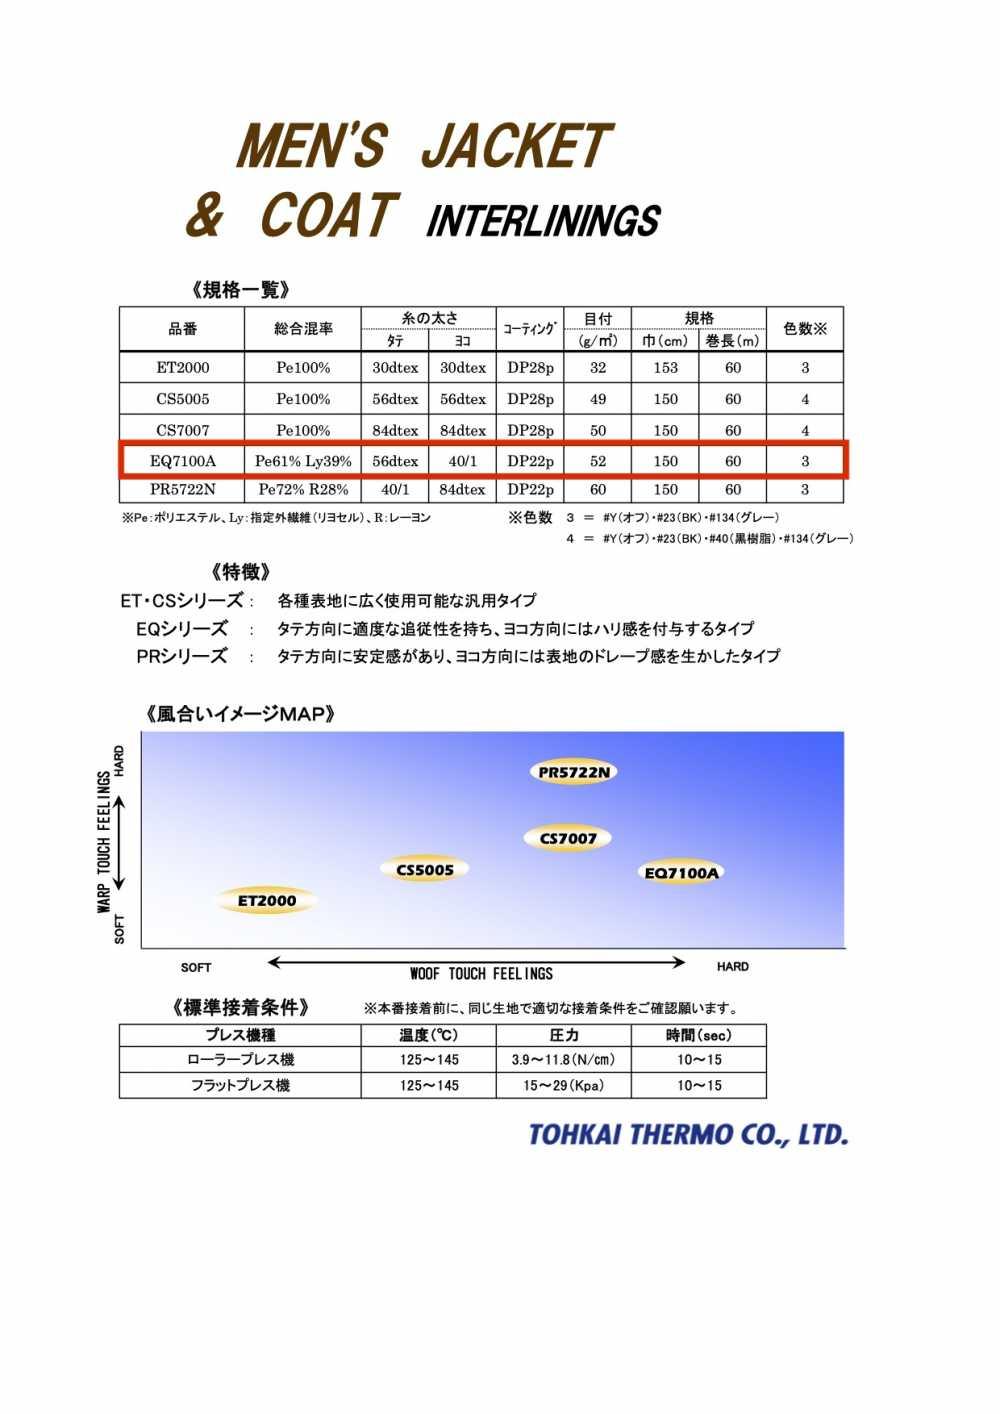 EQ7100A EQシリーズ<重衣料向接着芯>[芯地] 東海サーモ(Thermo)/オークラ商事 - ApparelX アパレル資材卸通販